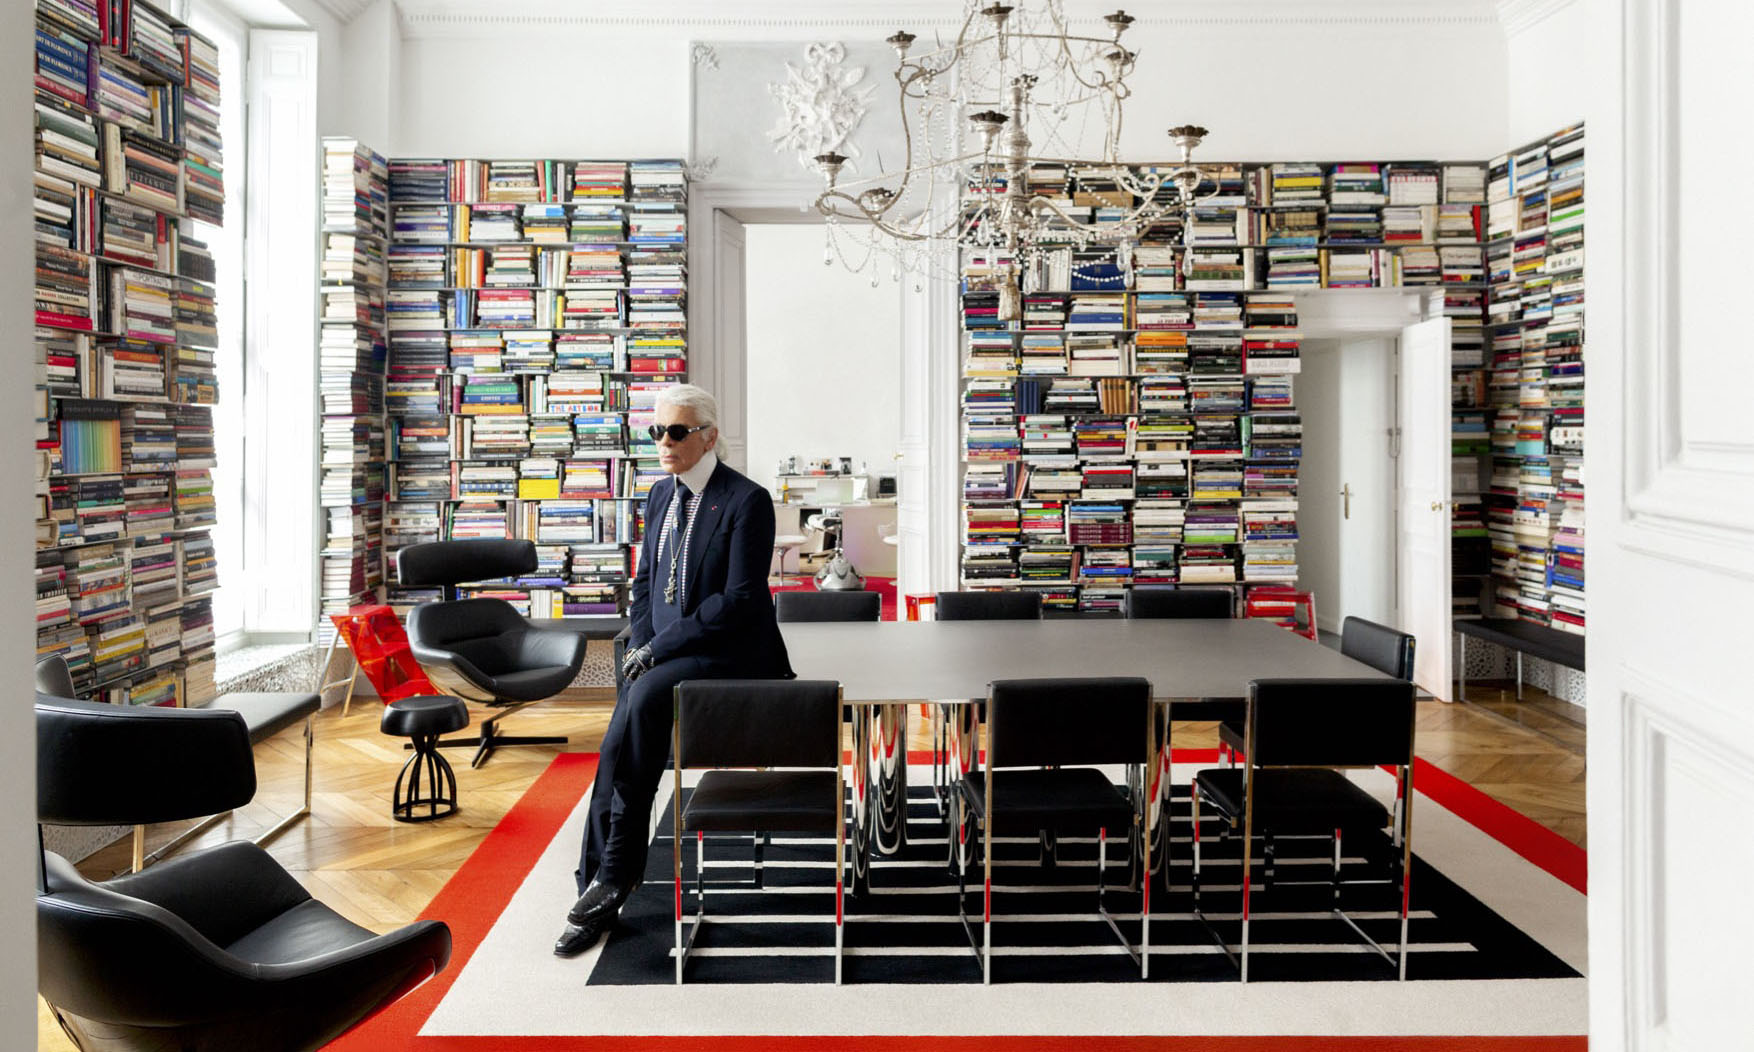 Karl Lagerfeld 摩纳哥故居物品将通过苏富比拍卖